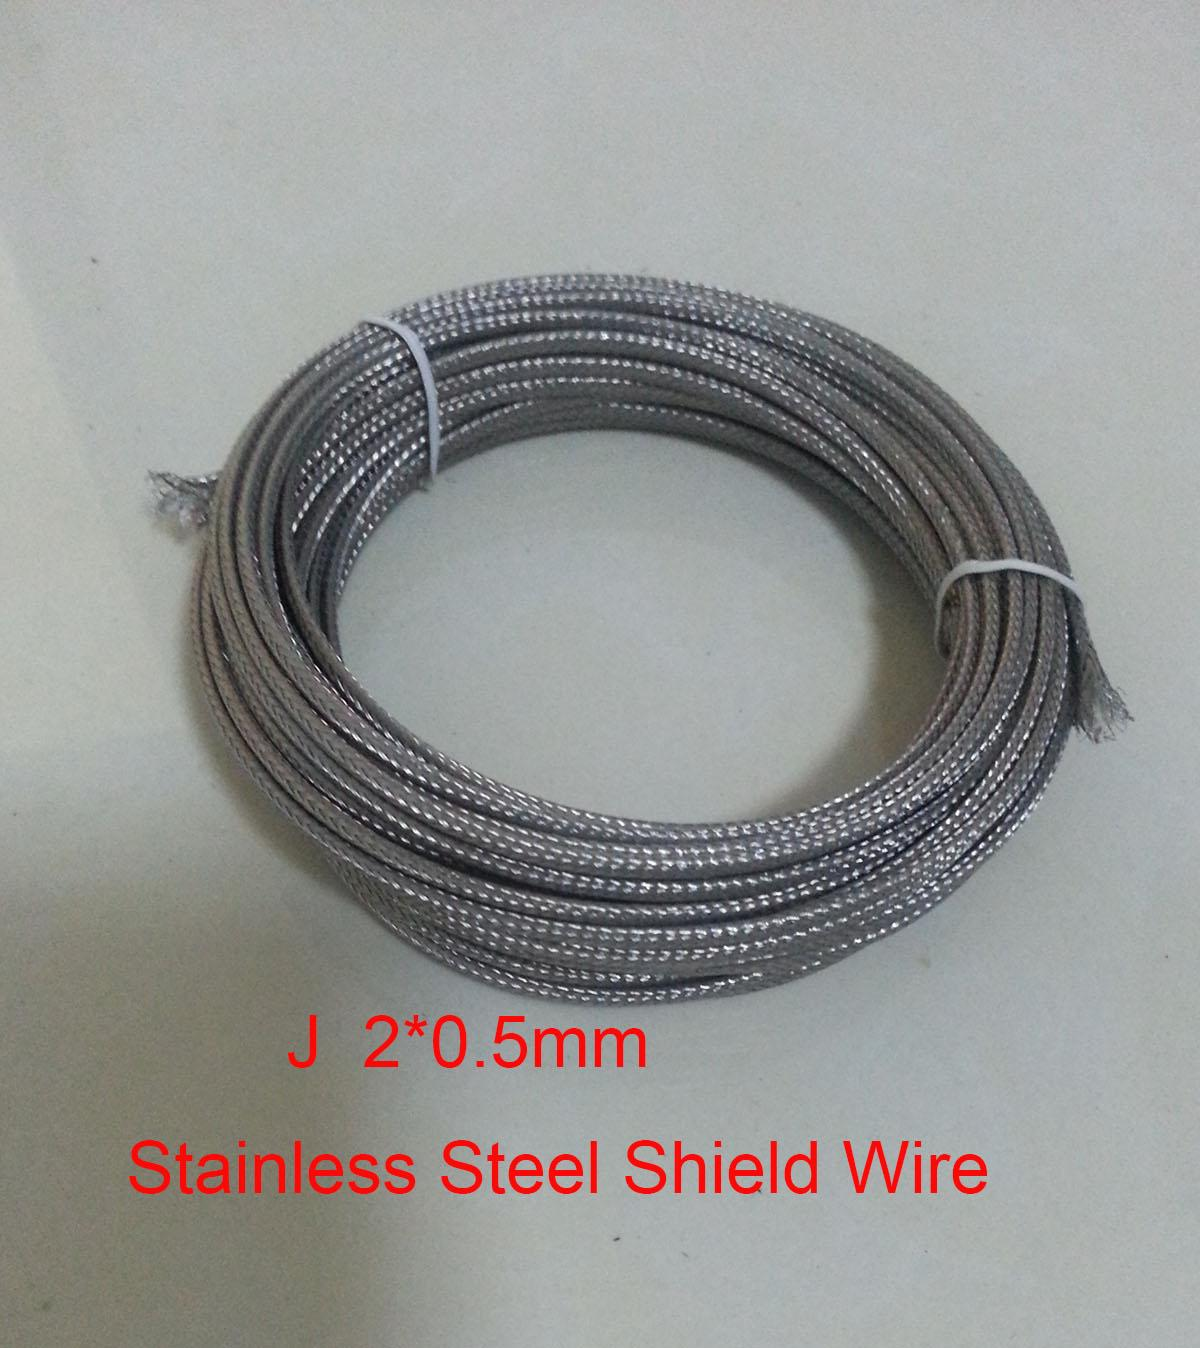 2018 J Type 2*0.5mm Fiberglass Coated Stainless Steel Shield ...